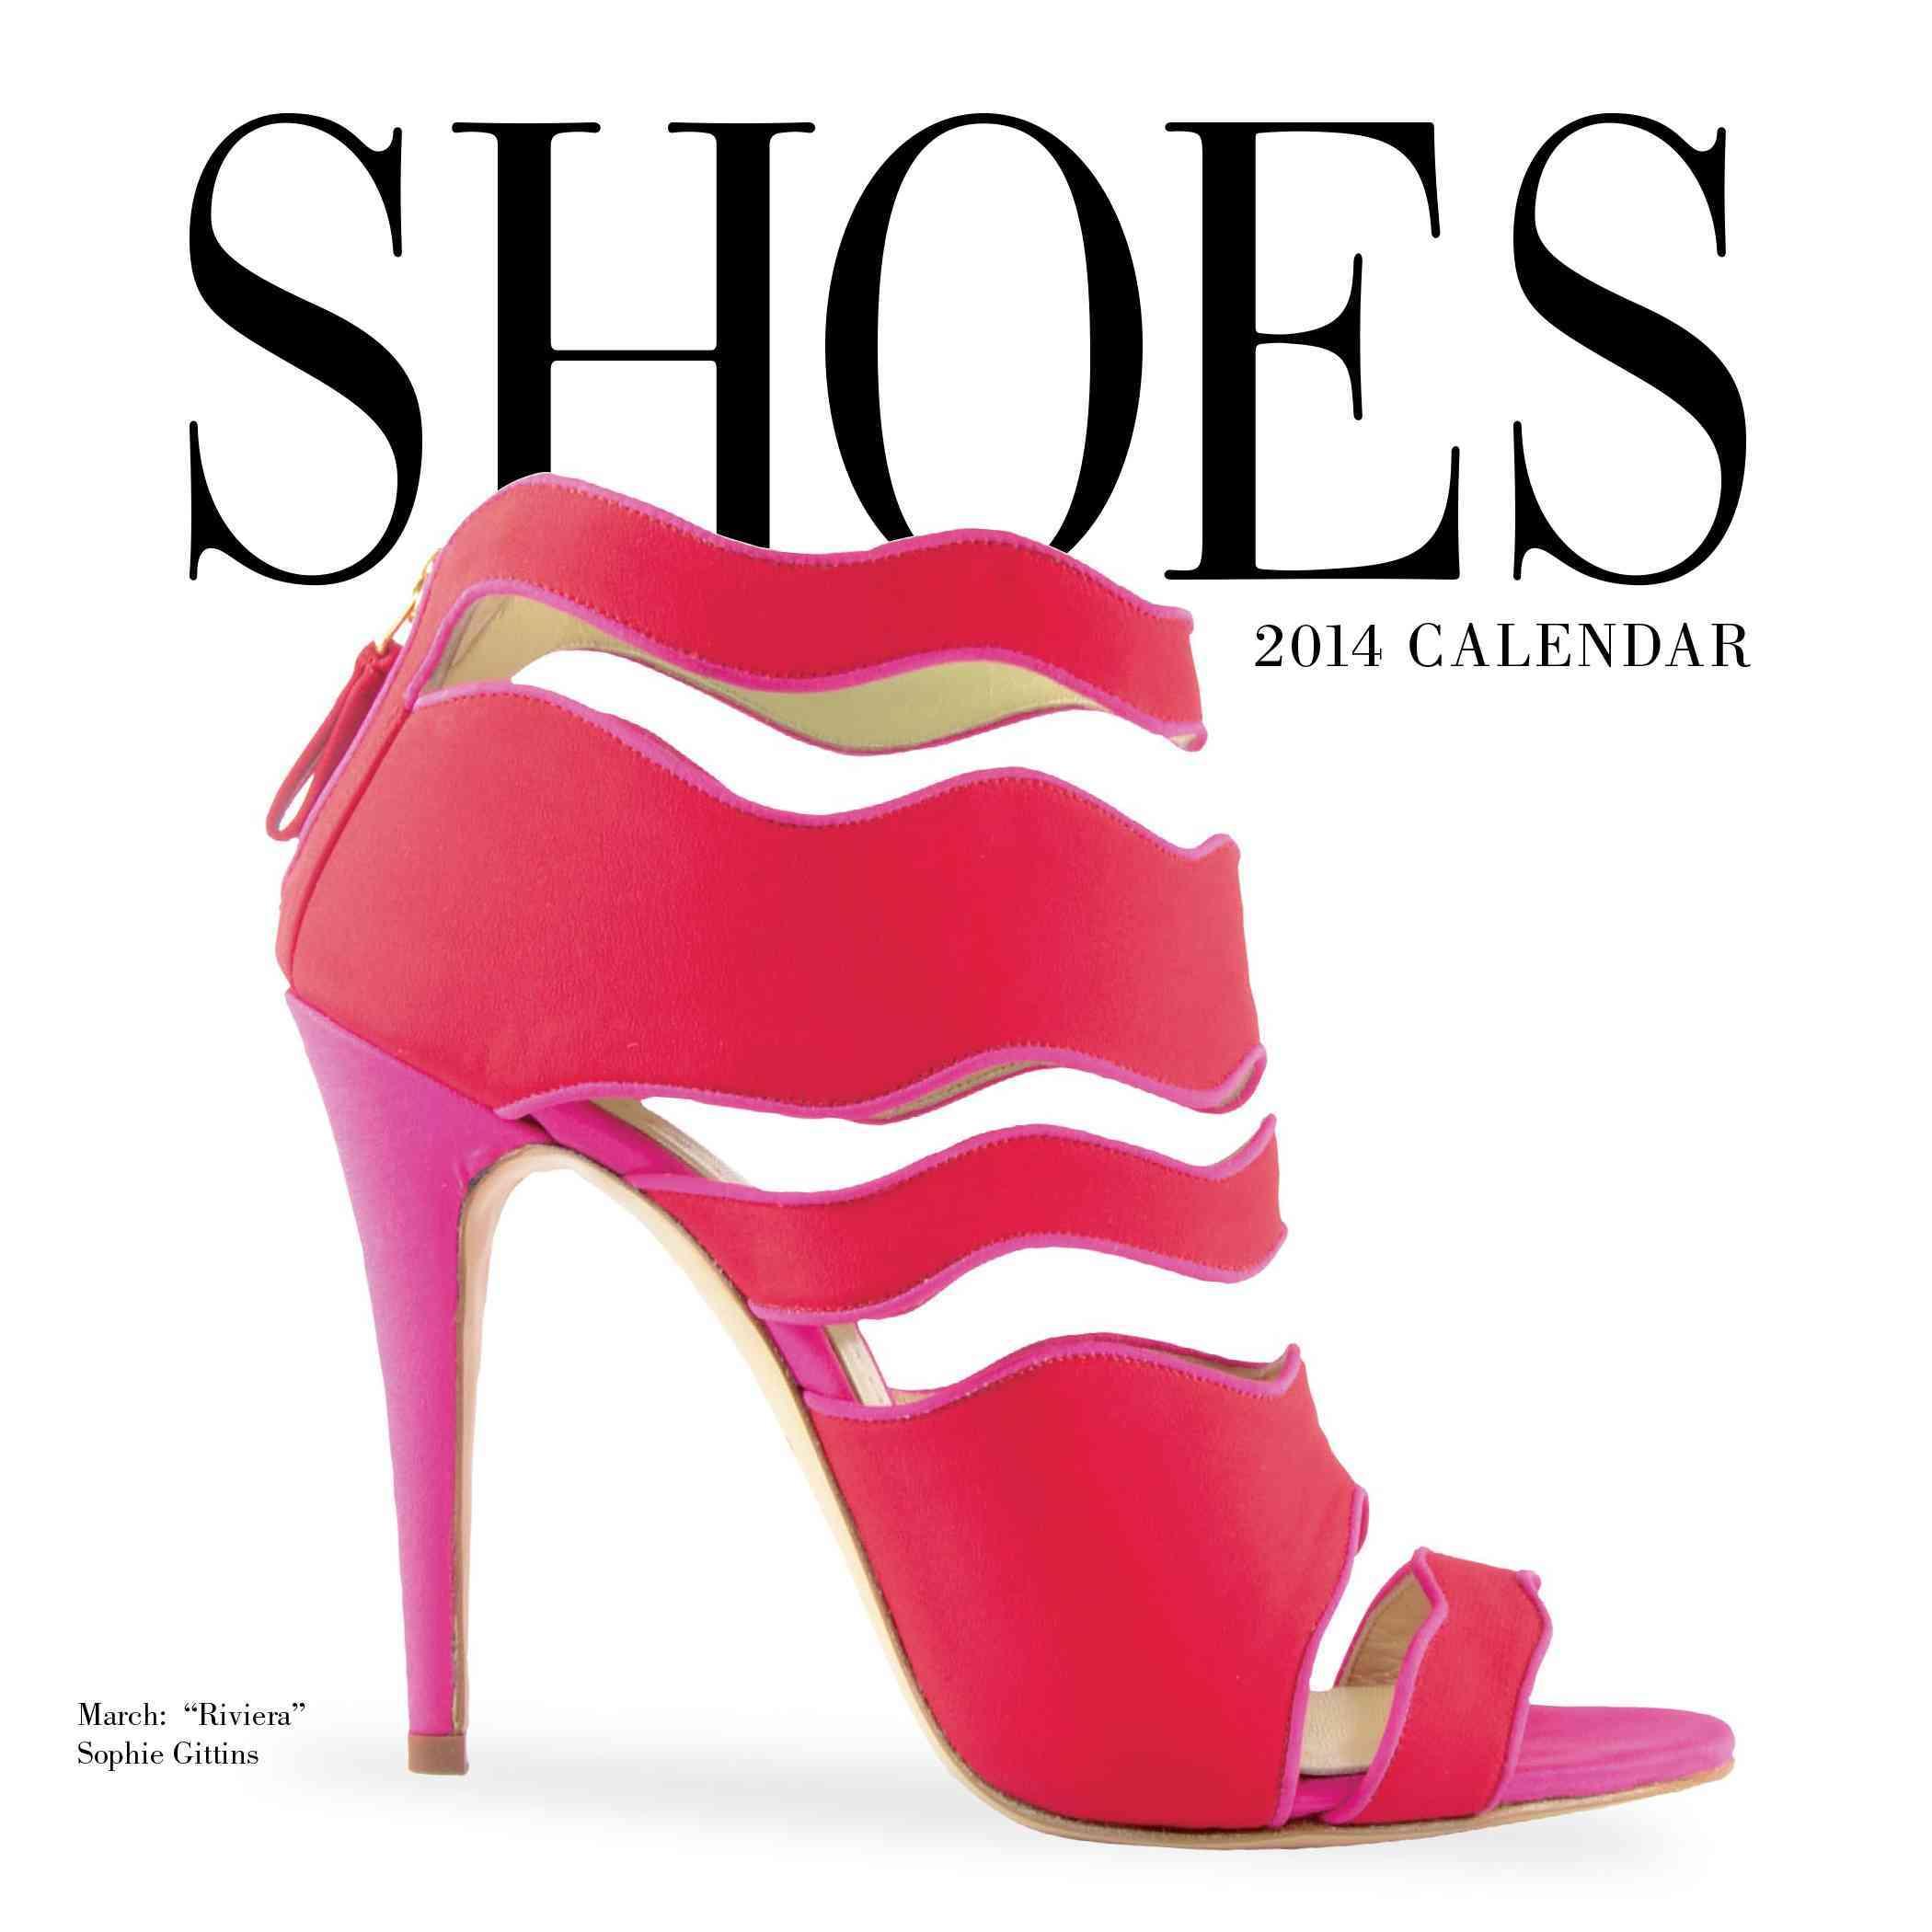 Shoes 2014 Calendar (Calendar)